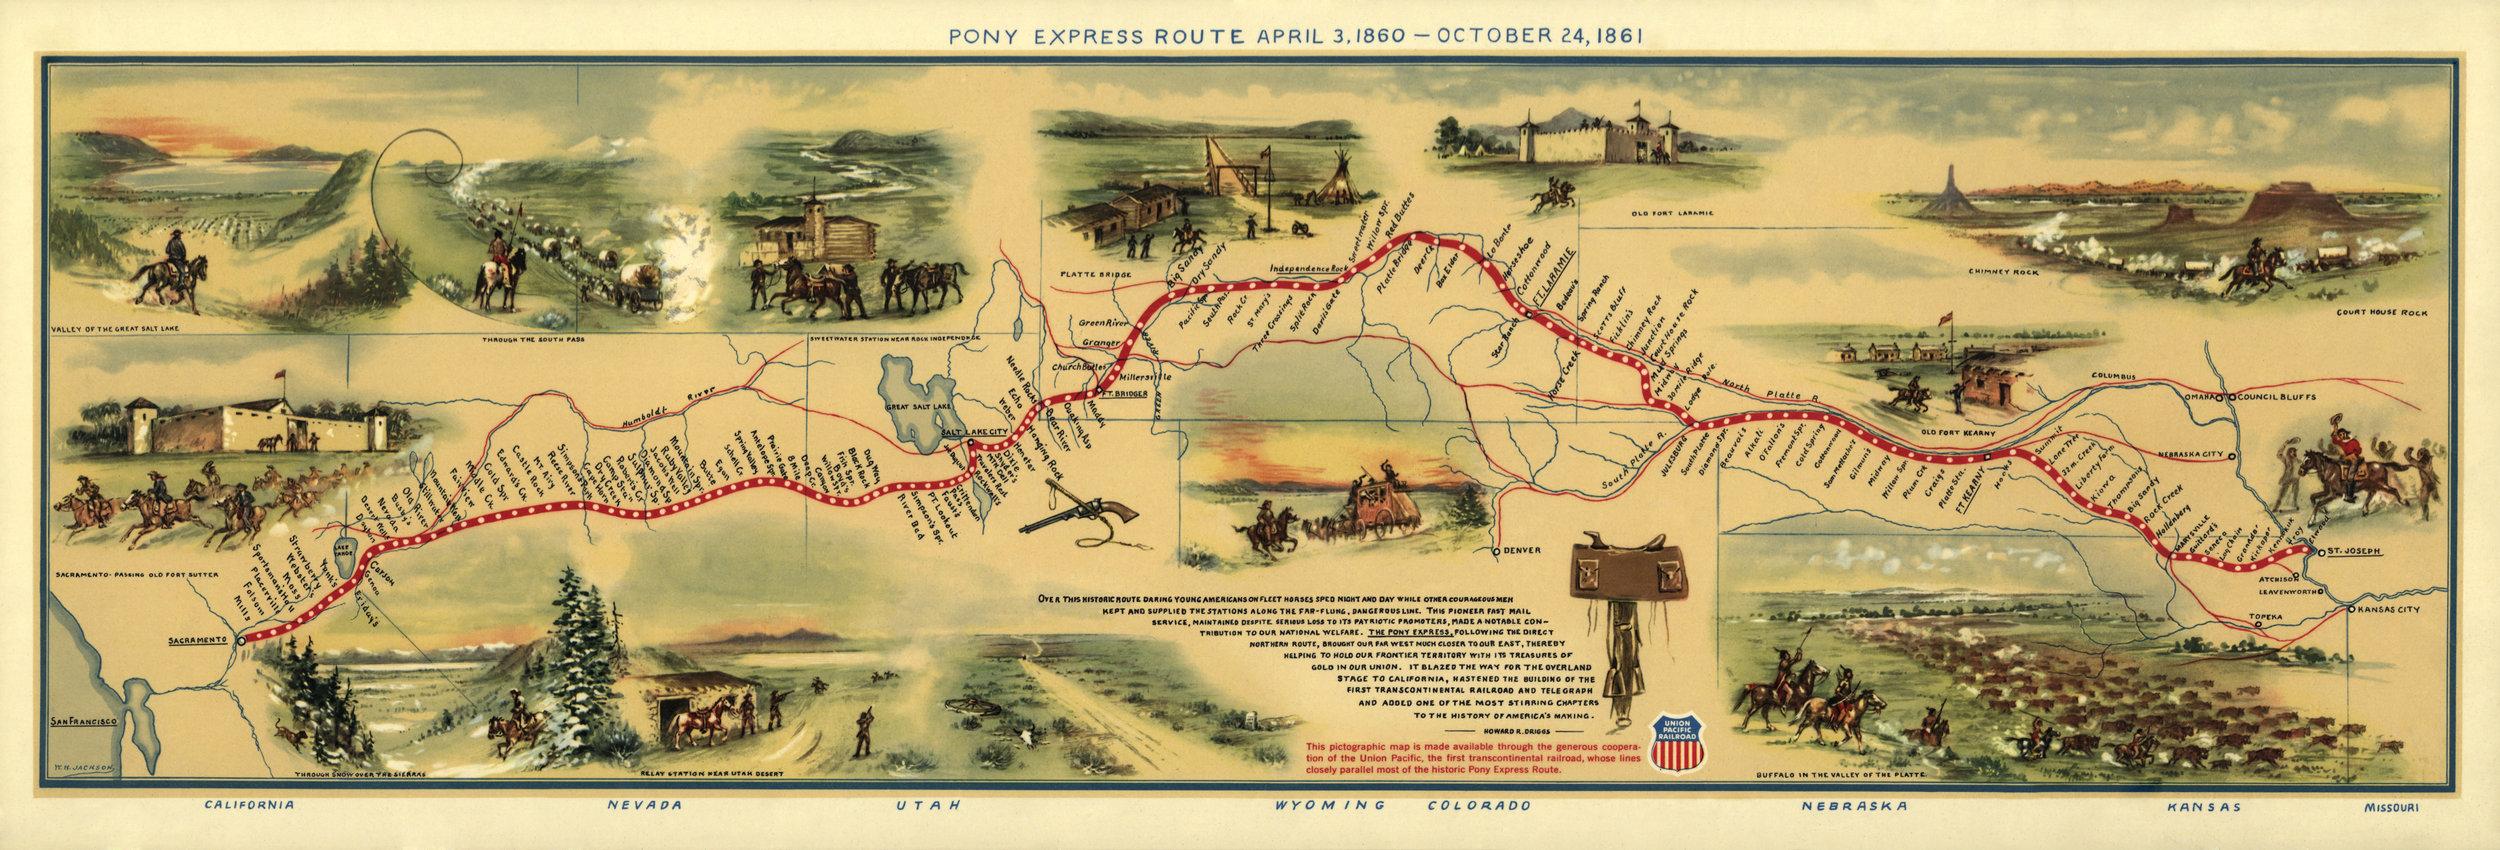 Pony_Express_Map_William_Henry_Jackson.jpg